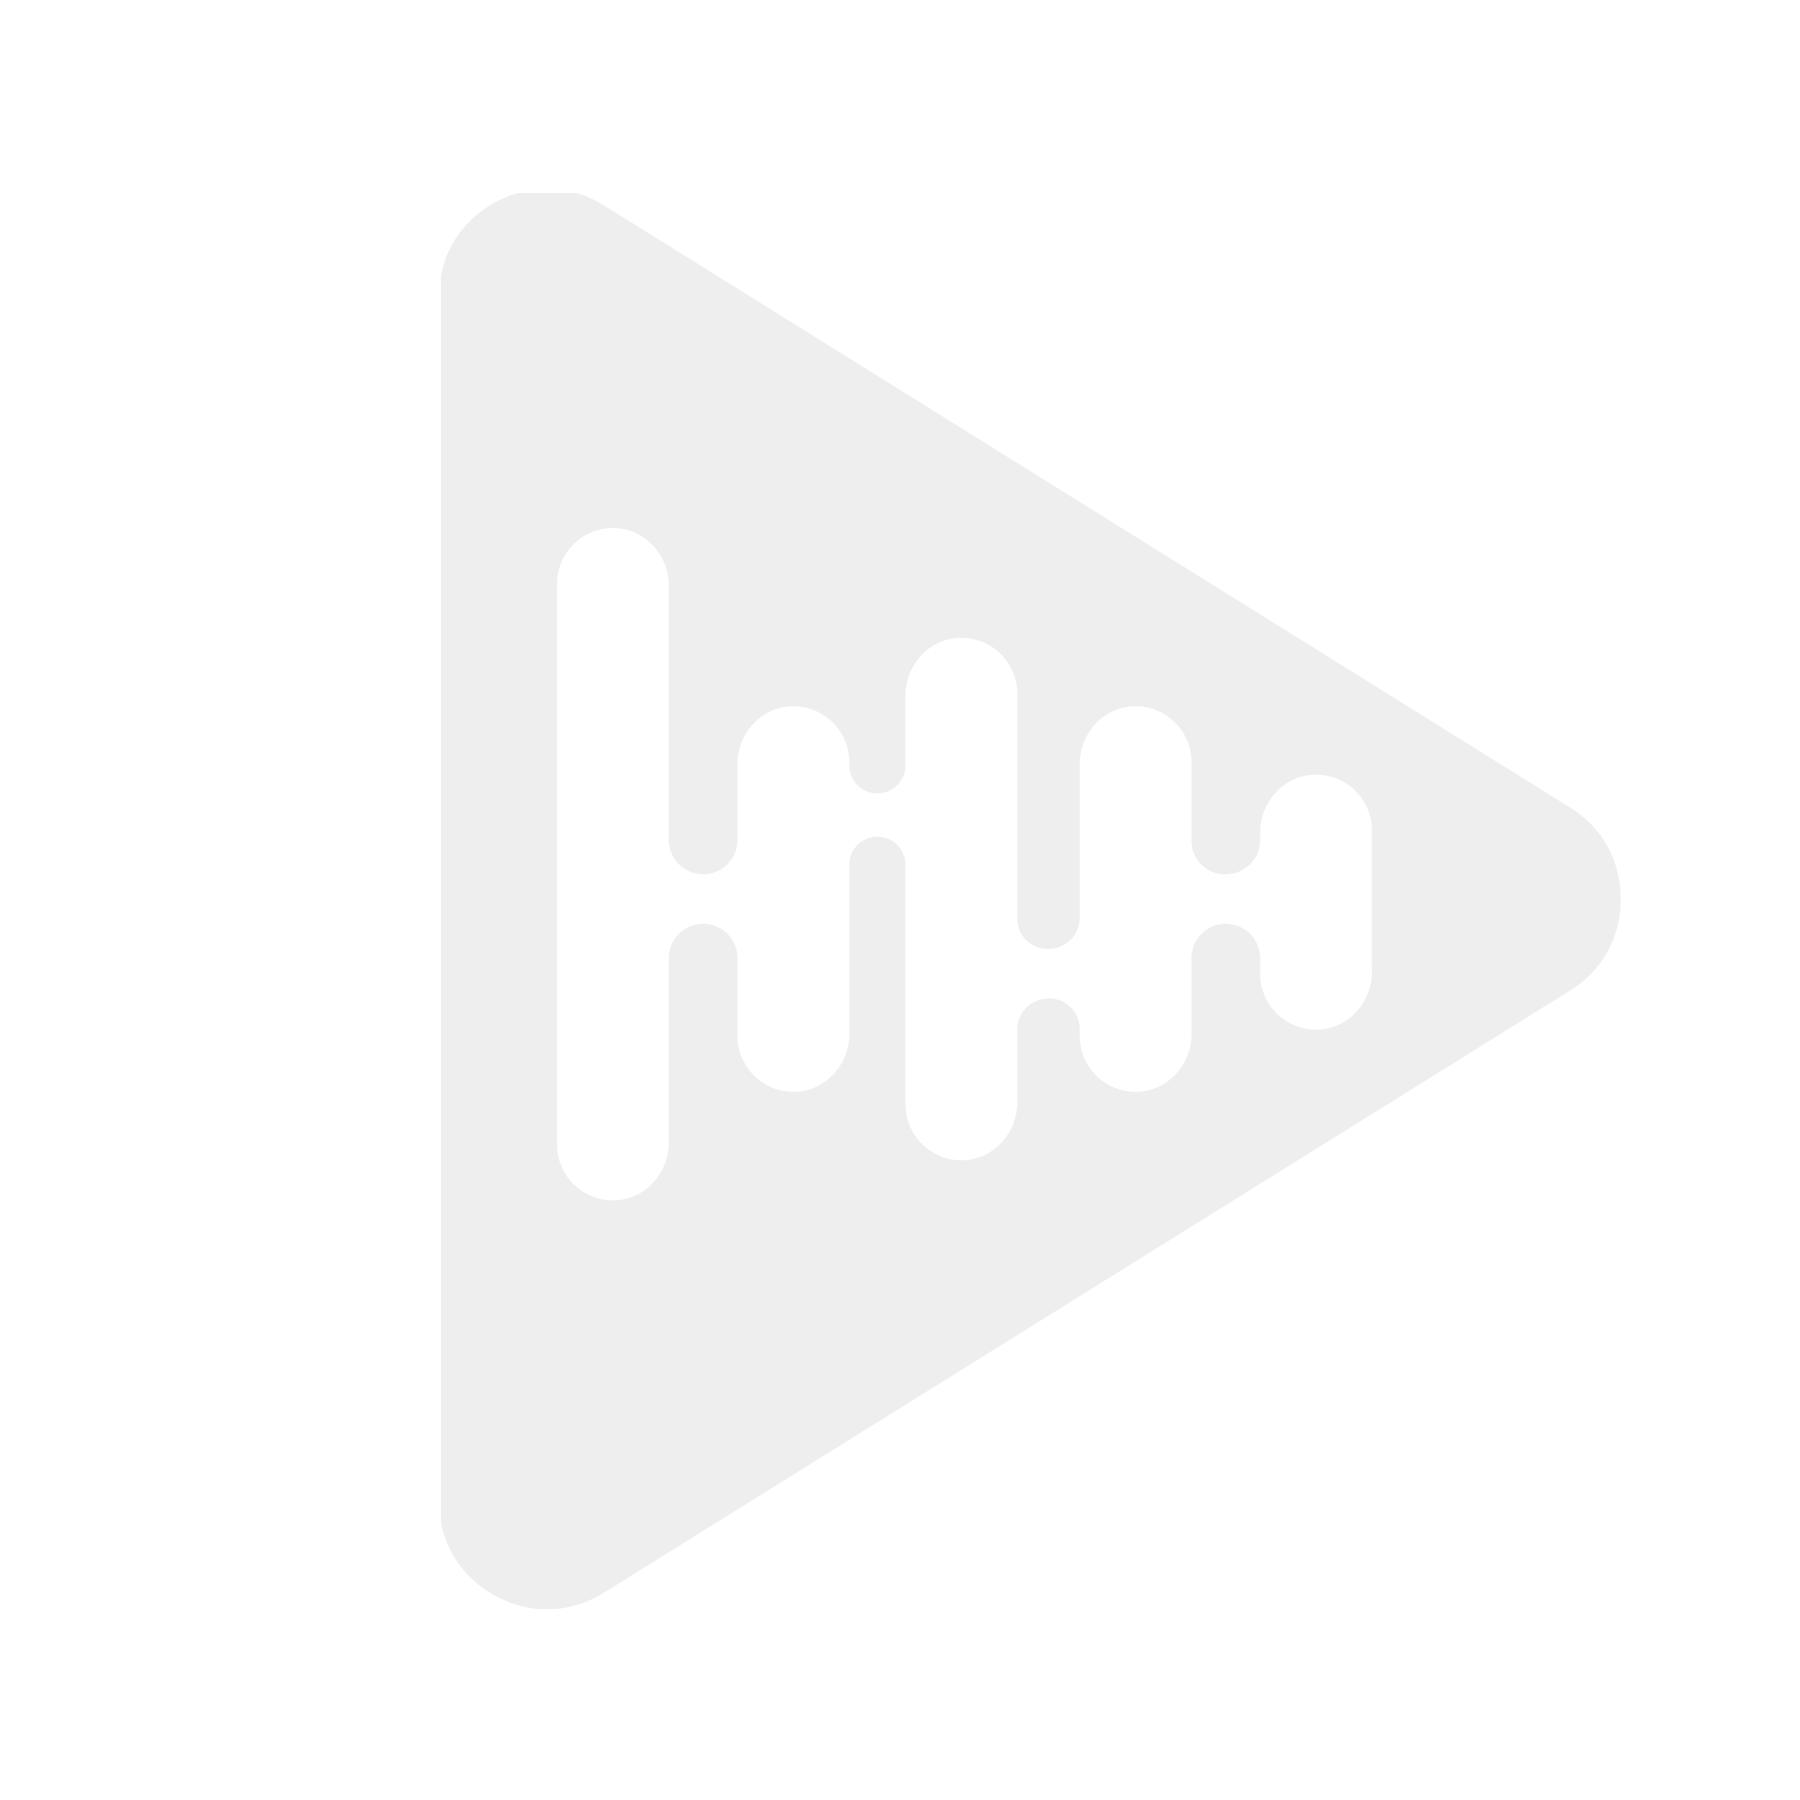 Onkyo D-045 B - Bokhyllehøyttaler, toveis, 70 W, sort (Par)